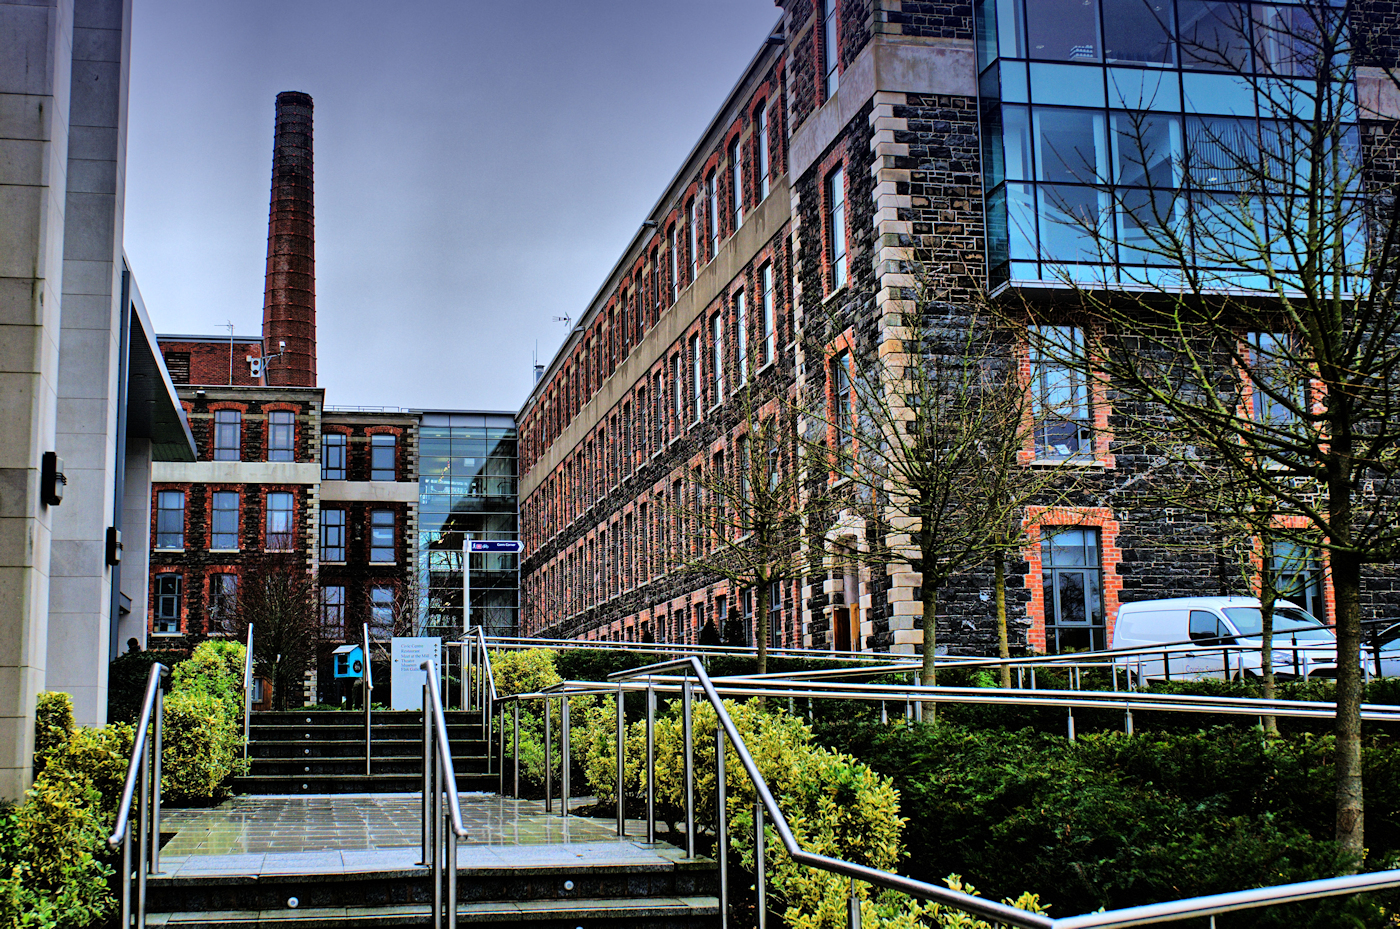 UK-NI-Co Antrim-Mossley Mill and  walkFe